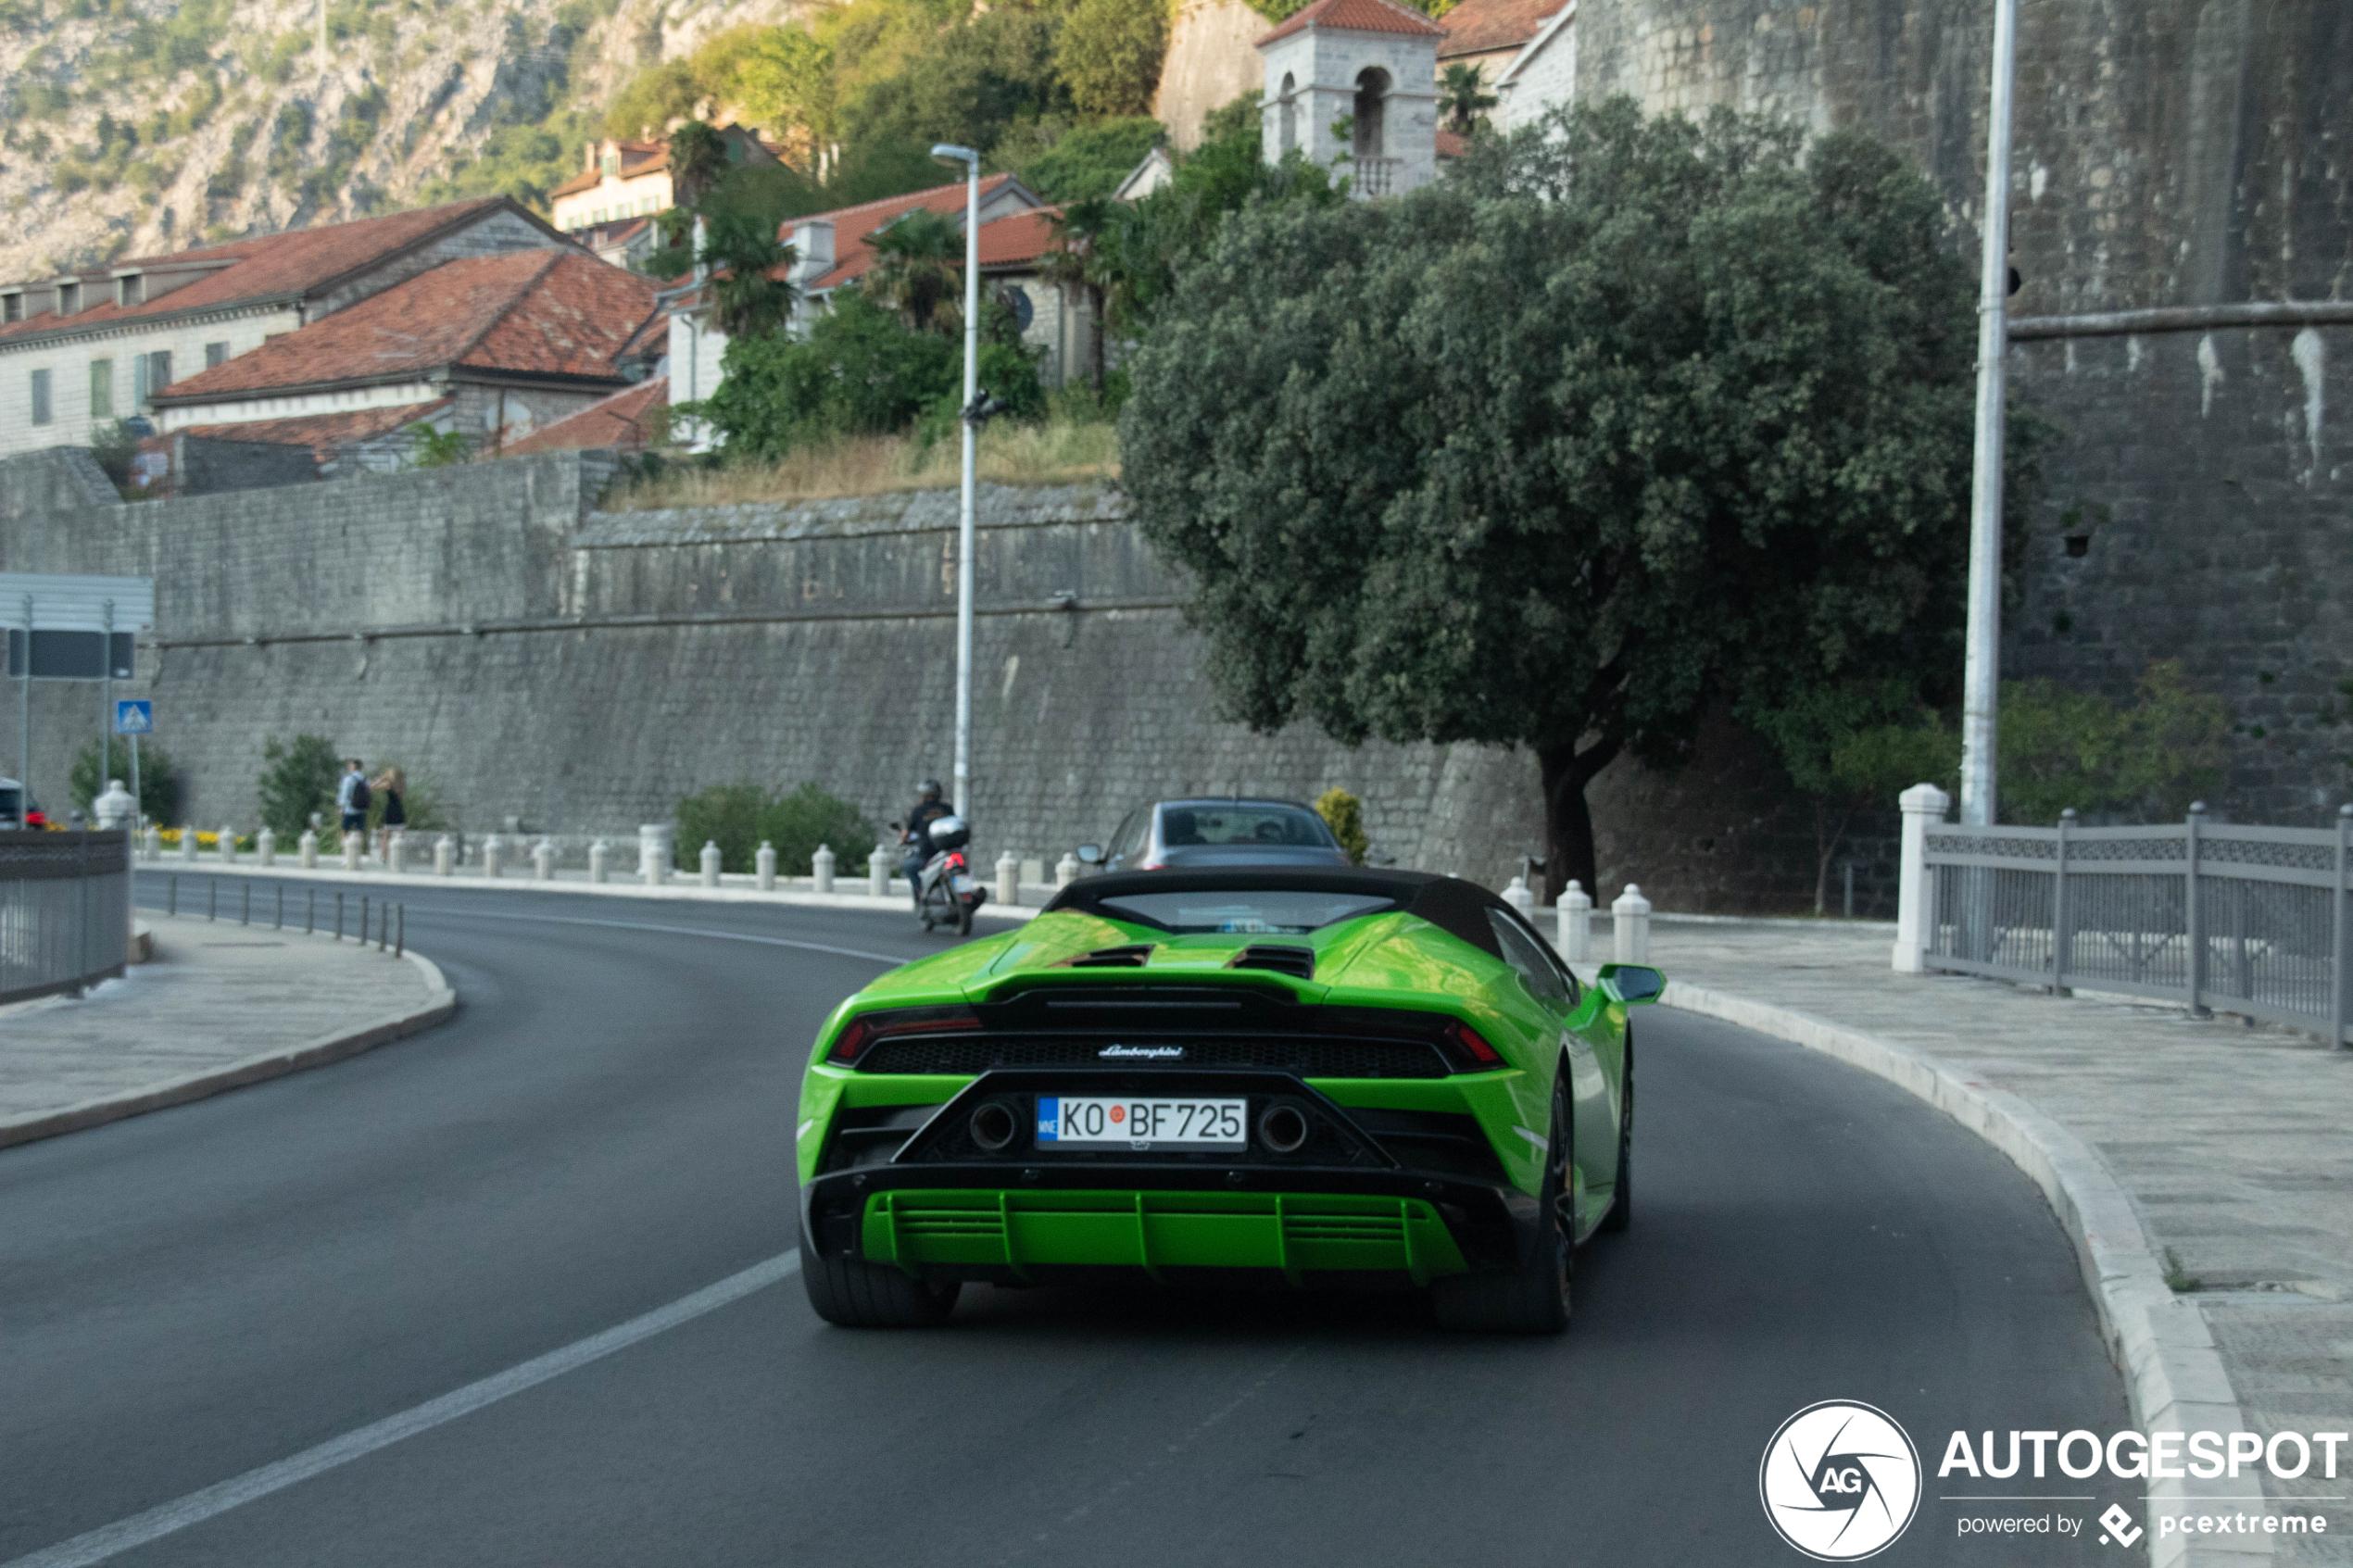 Welke groene Lambo gaat met jou mee naar huis?